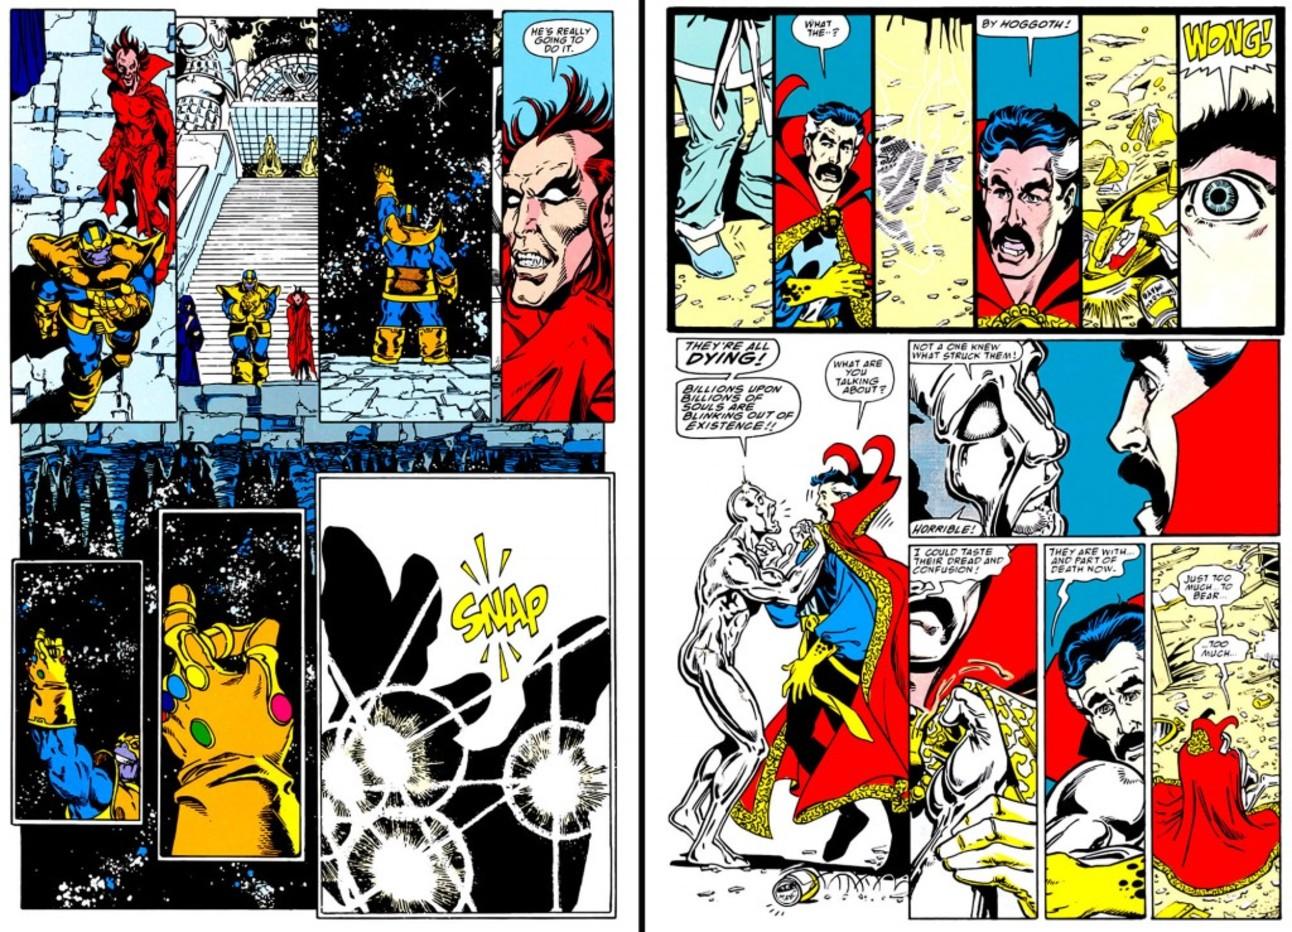 02-marvel-comics-thanos-kills-half-universe.jpg